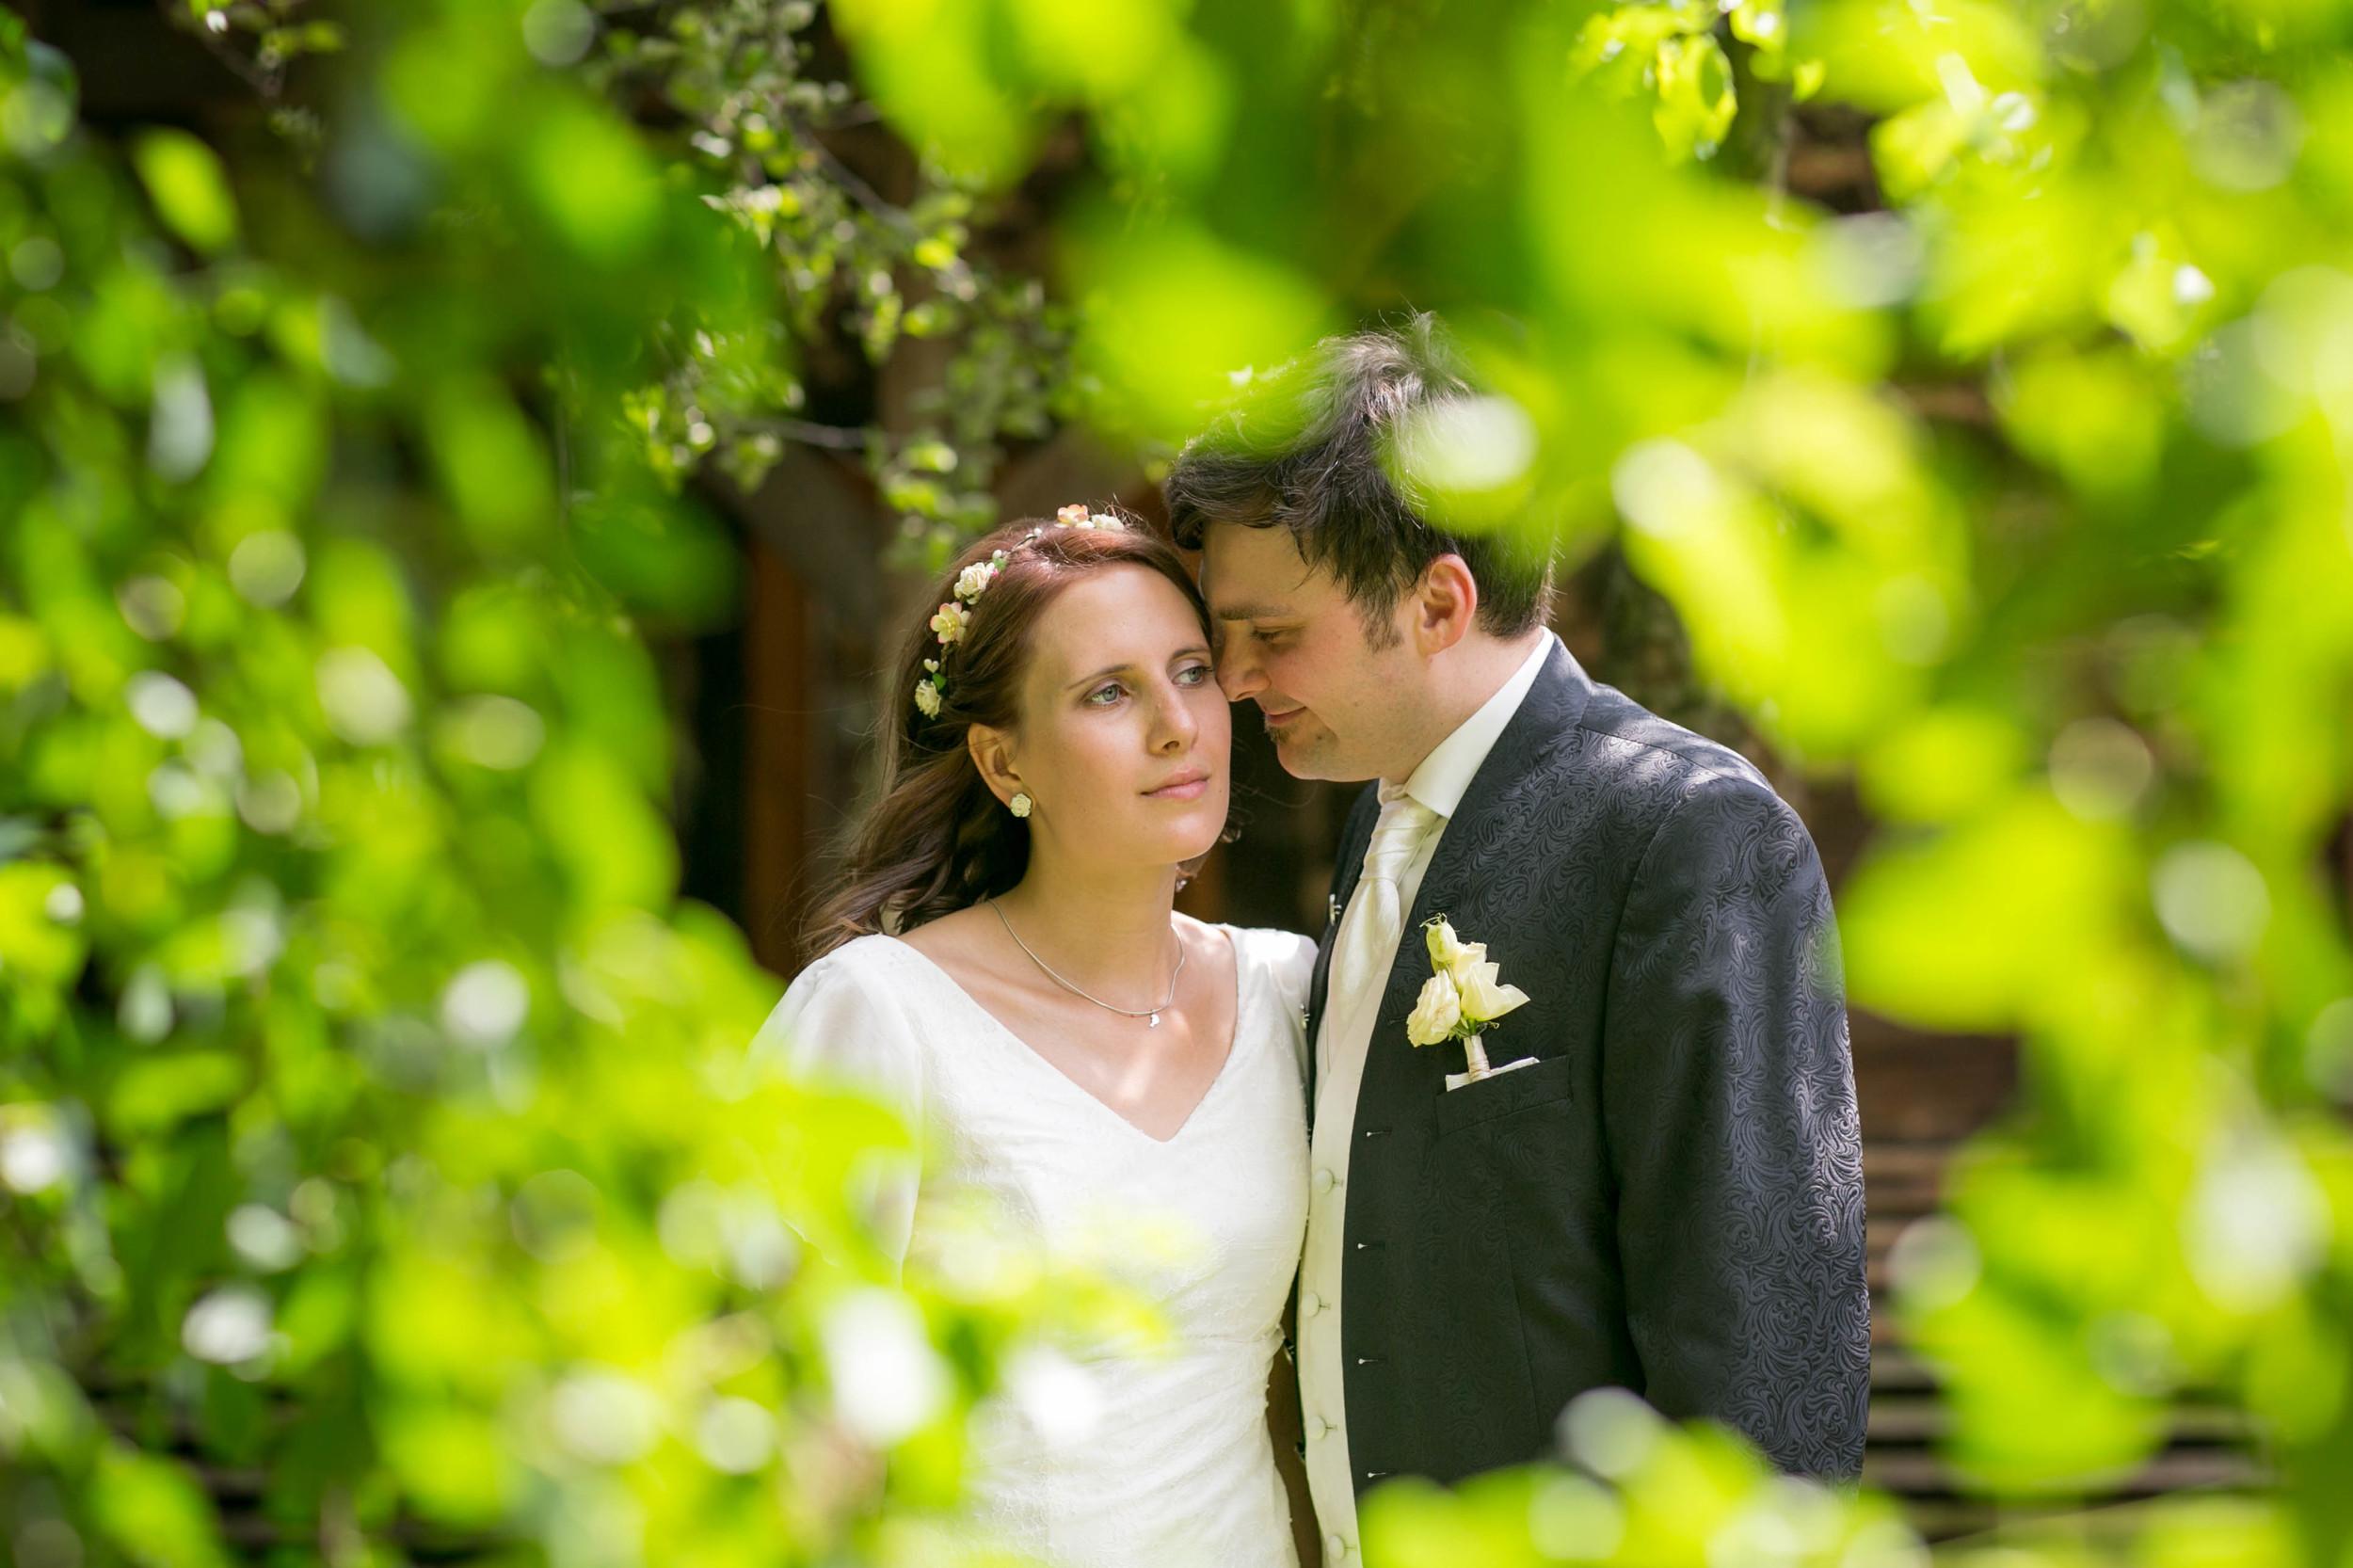 Spreewald Hochzeitsfotografie_Fran Burrows Fotografie-65.jpg